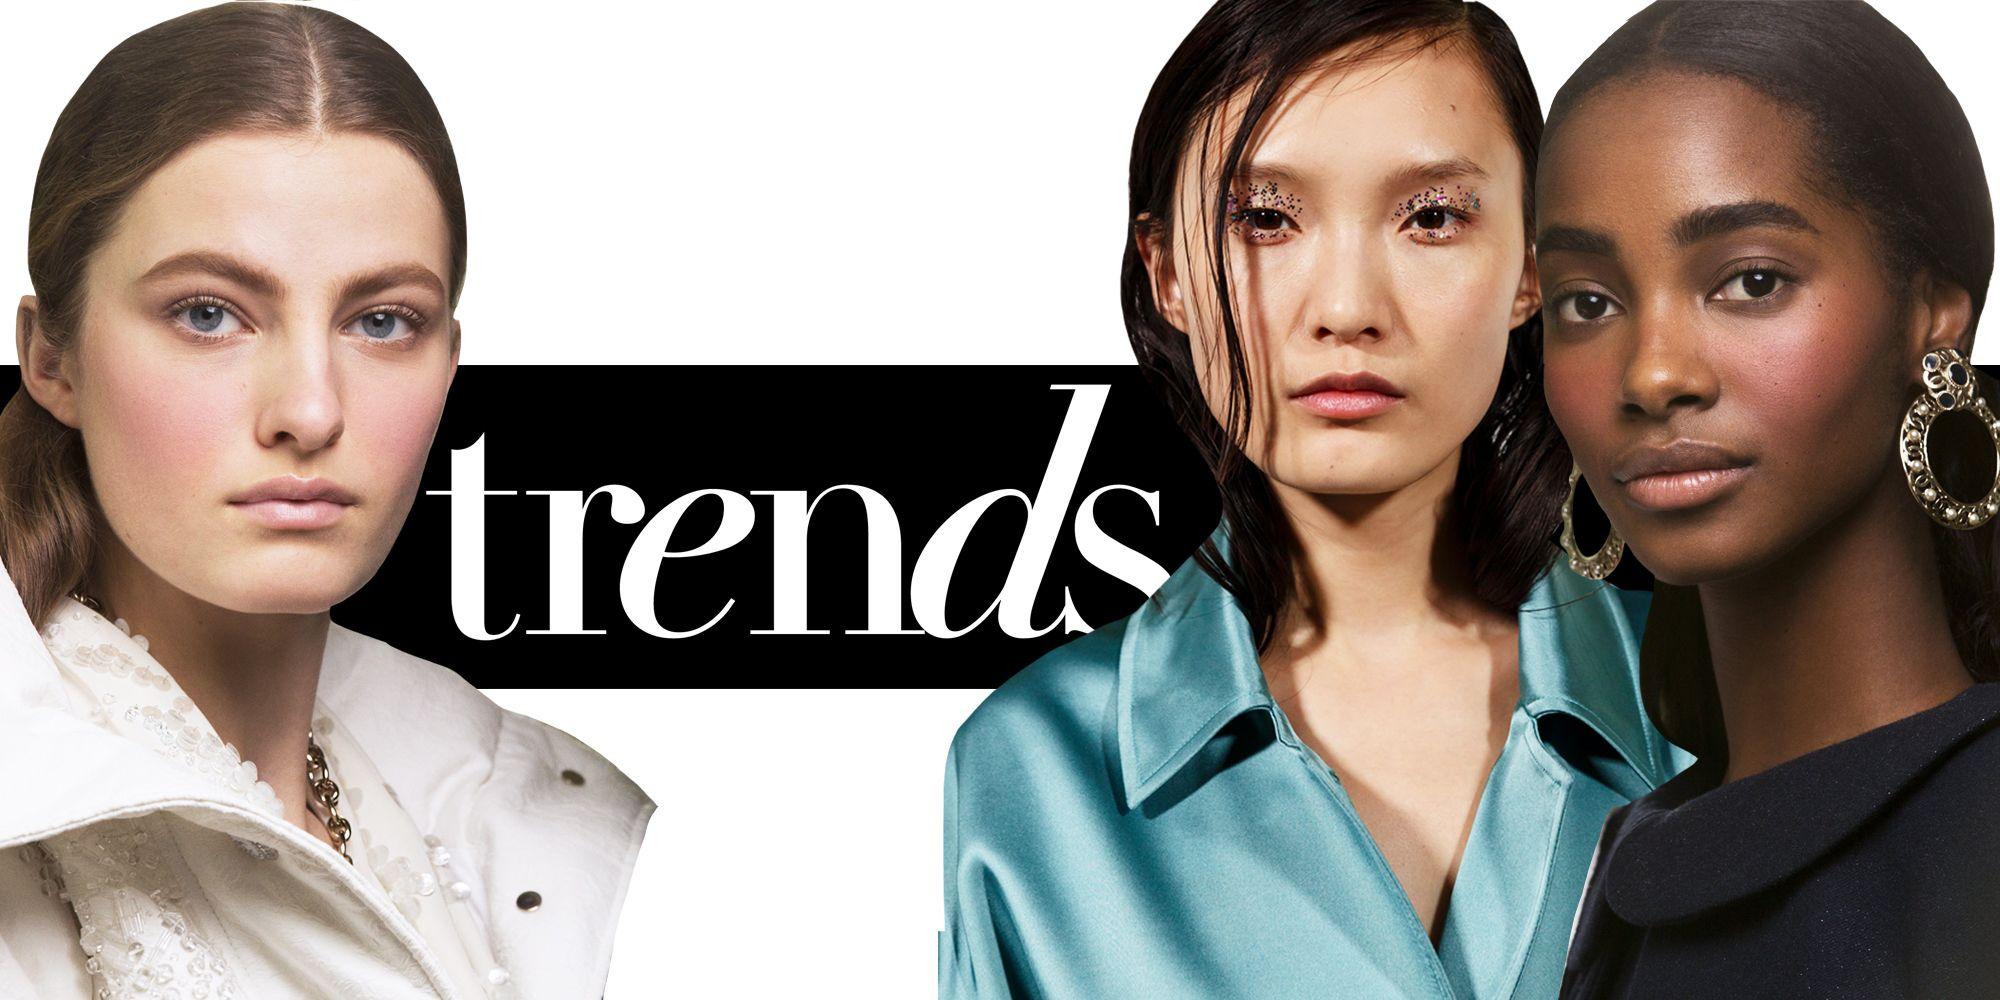 autumn/winter 2019 make-up trends